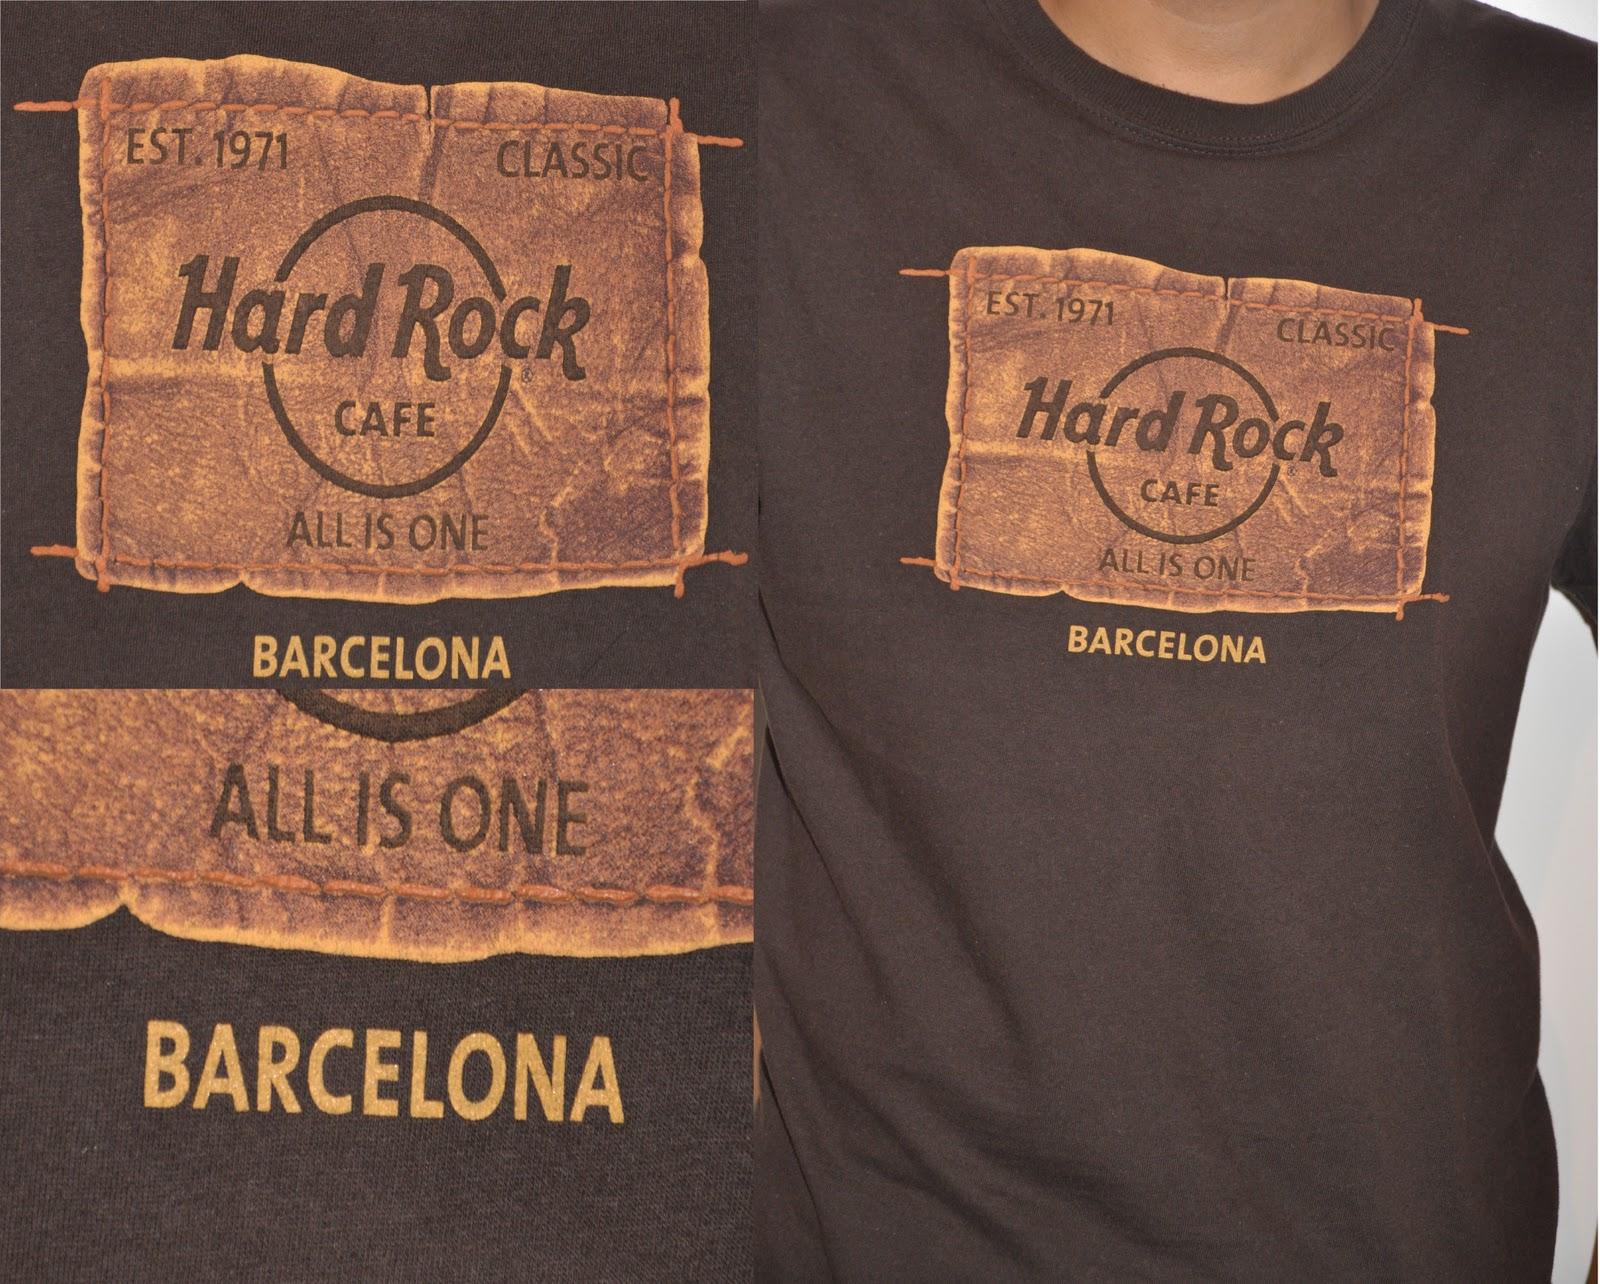 Design t shirt hard rock cafe - Design T Shirt Hard Rock Cafe In General Hard Rock Cafe T Shirt Can Be